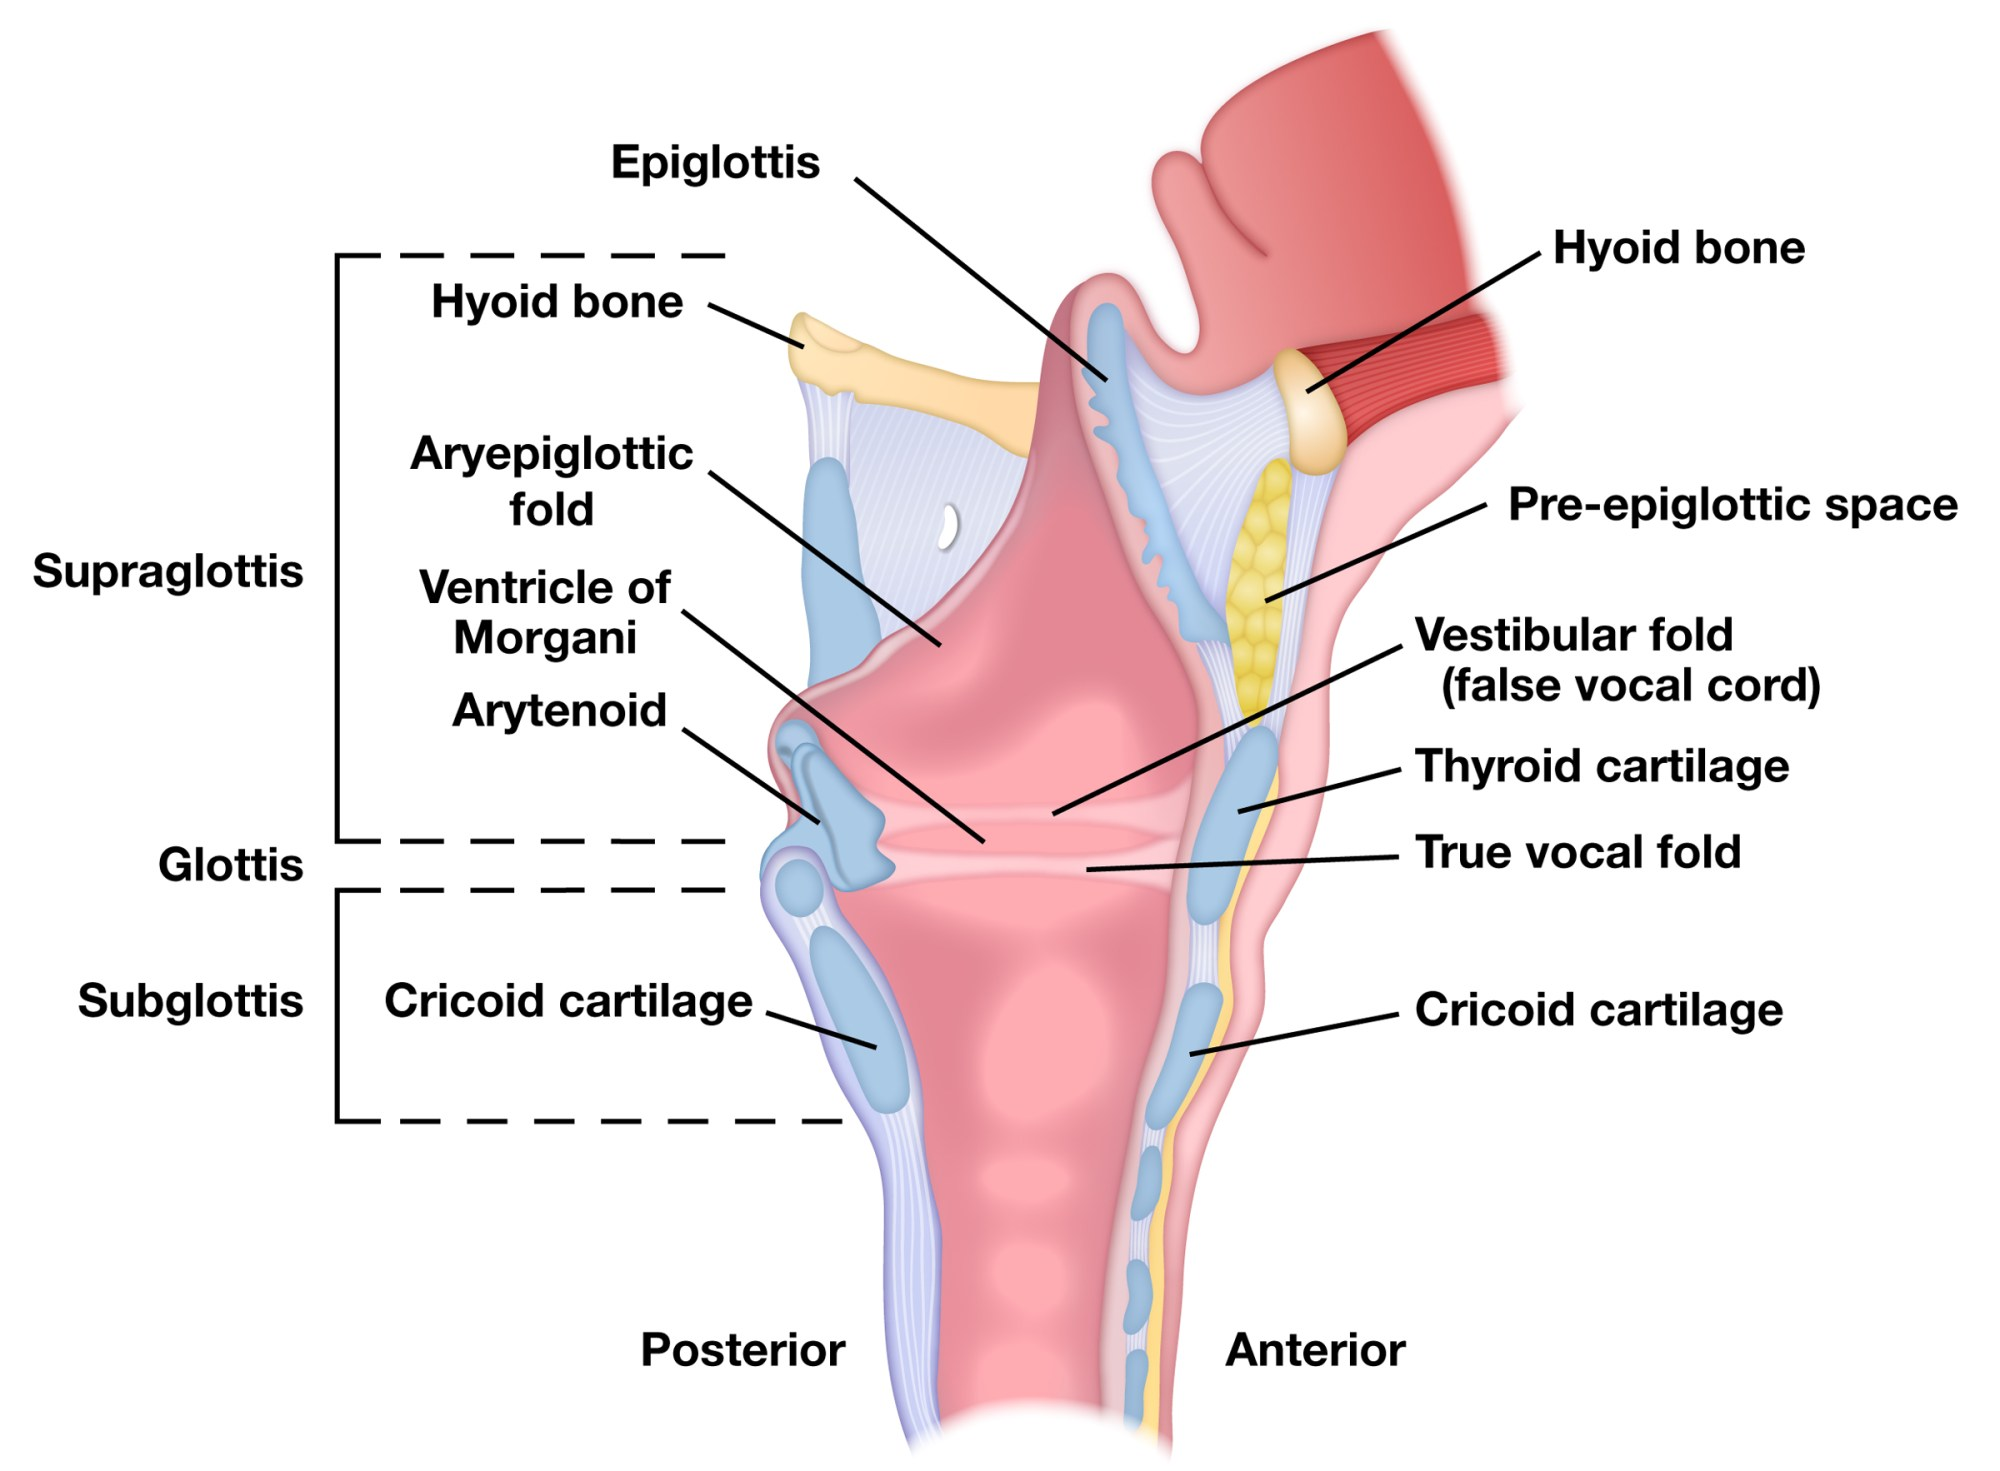 hight resolution of cross section of larynx